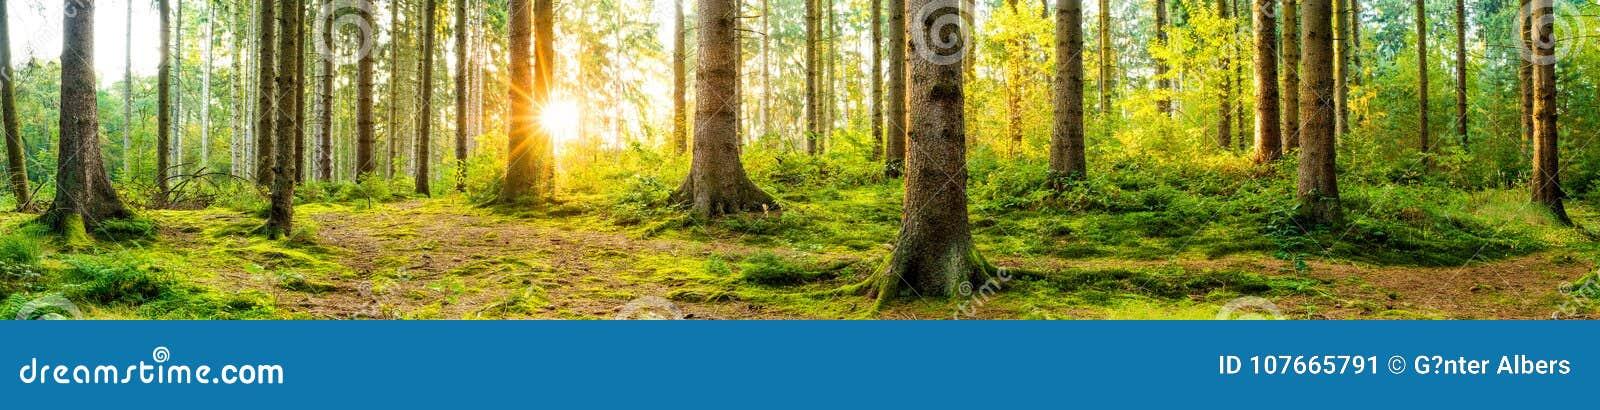 Mooi bos bij zonsopgang